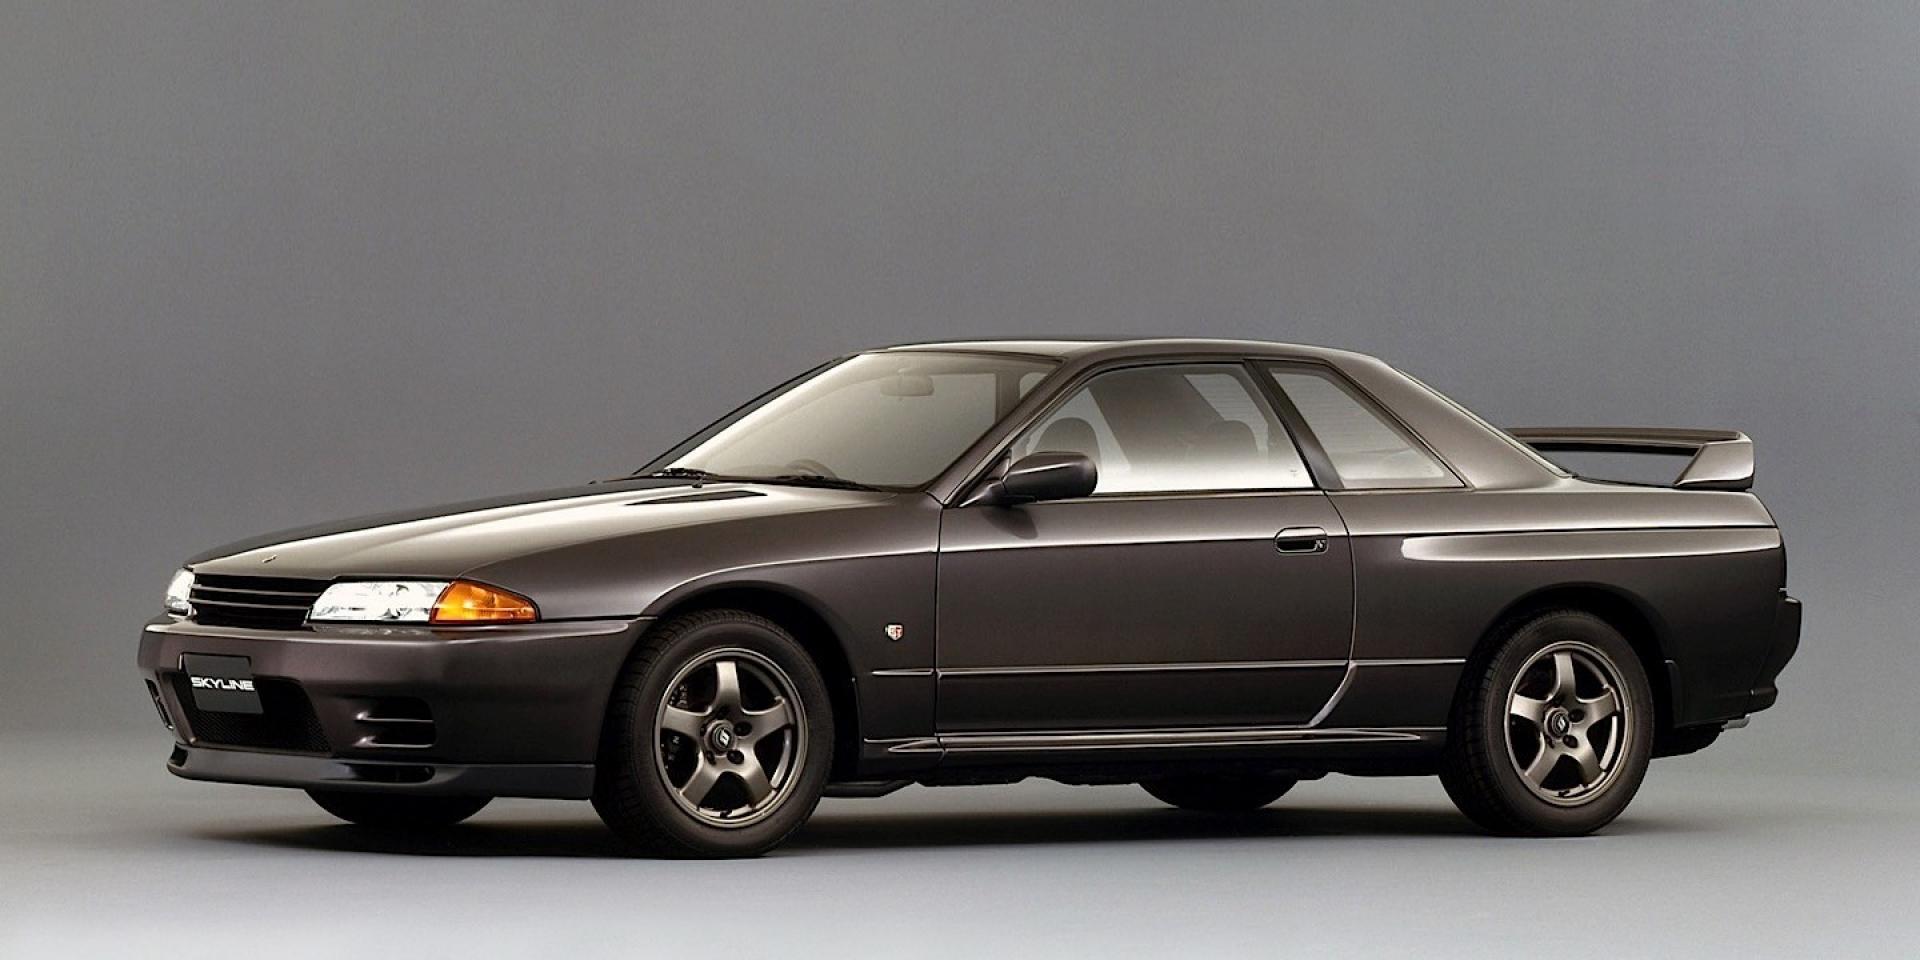 戰神不死計畫!Nissan重新生產Skyline GT-R R32零件